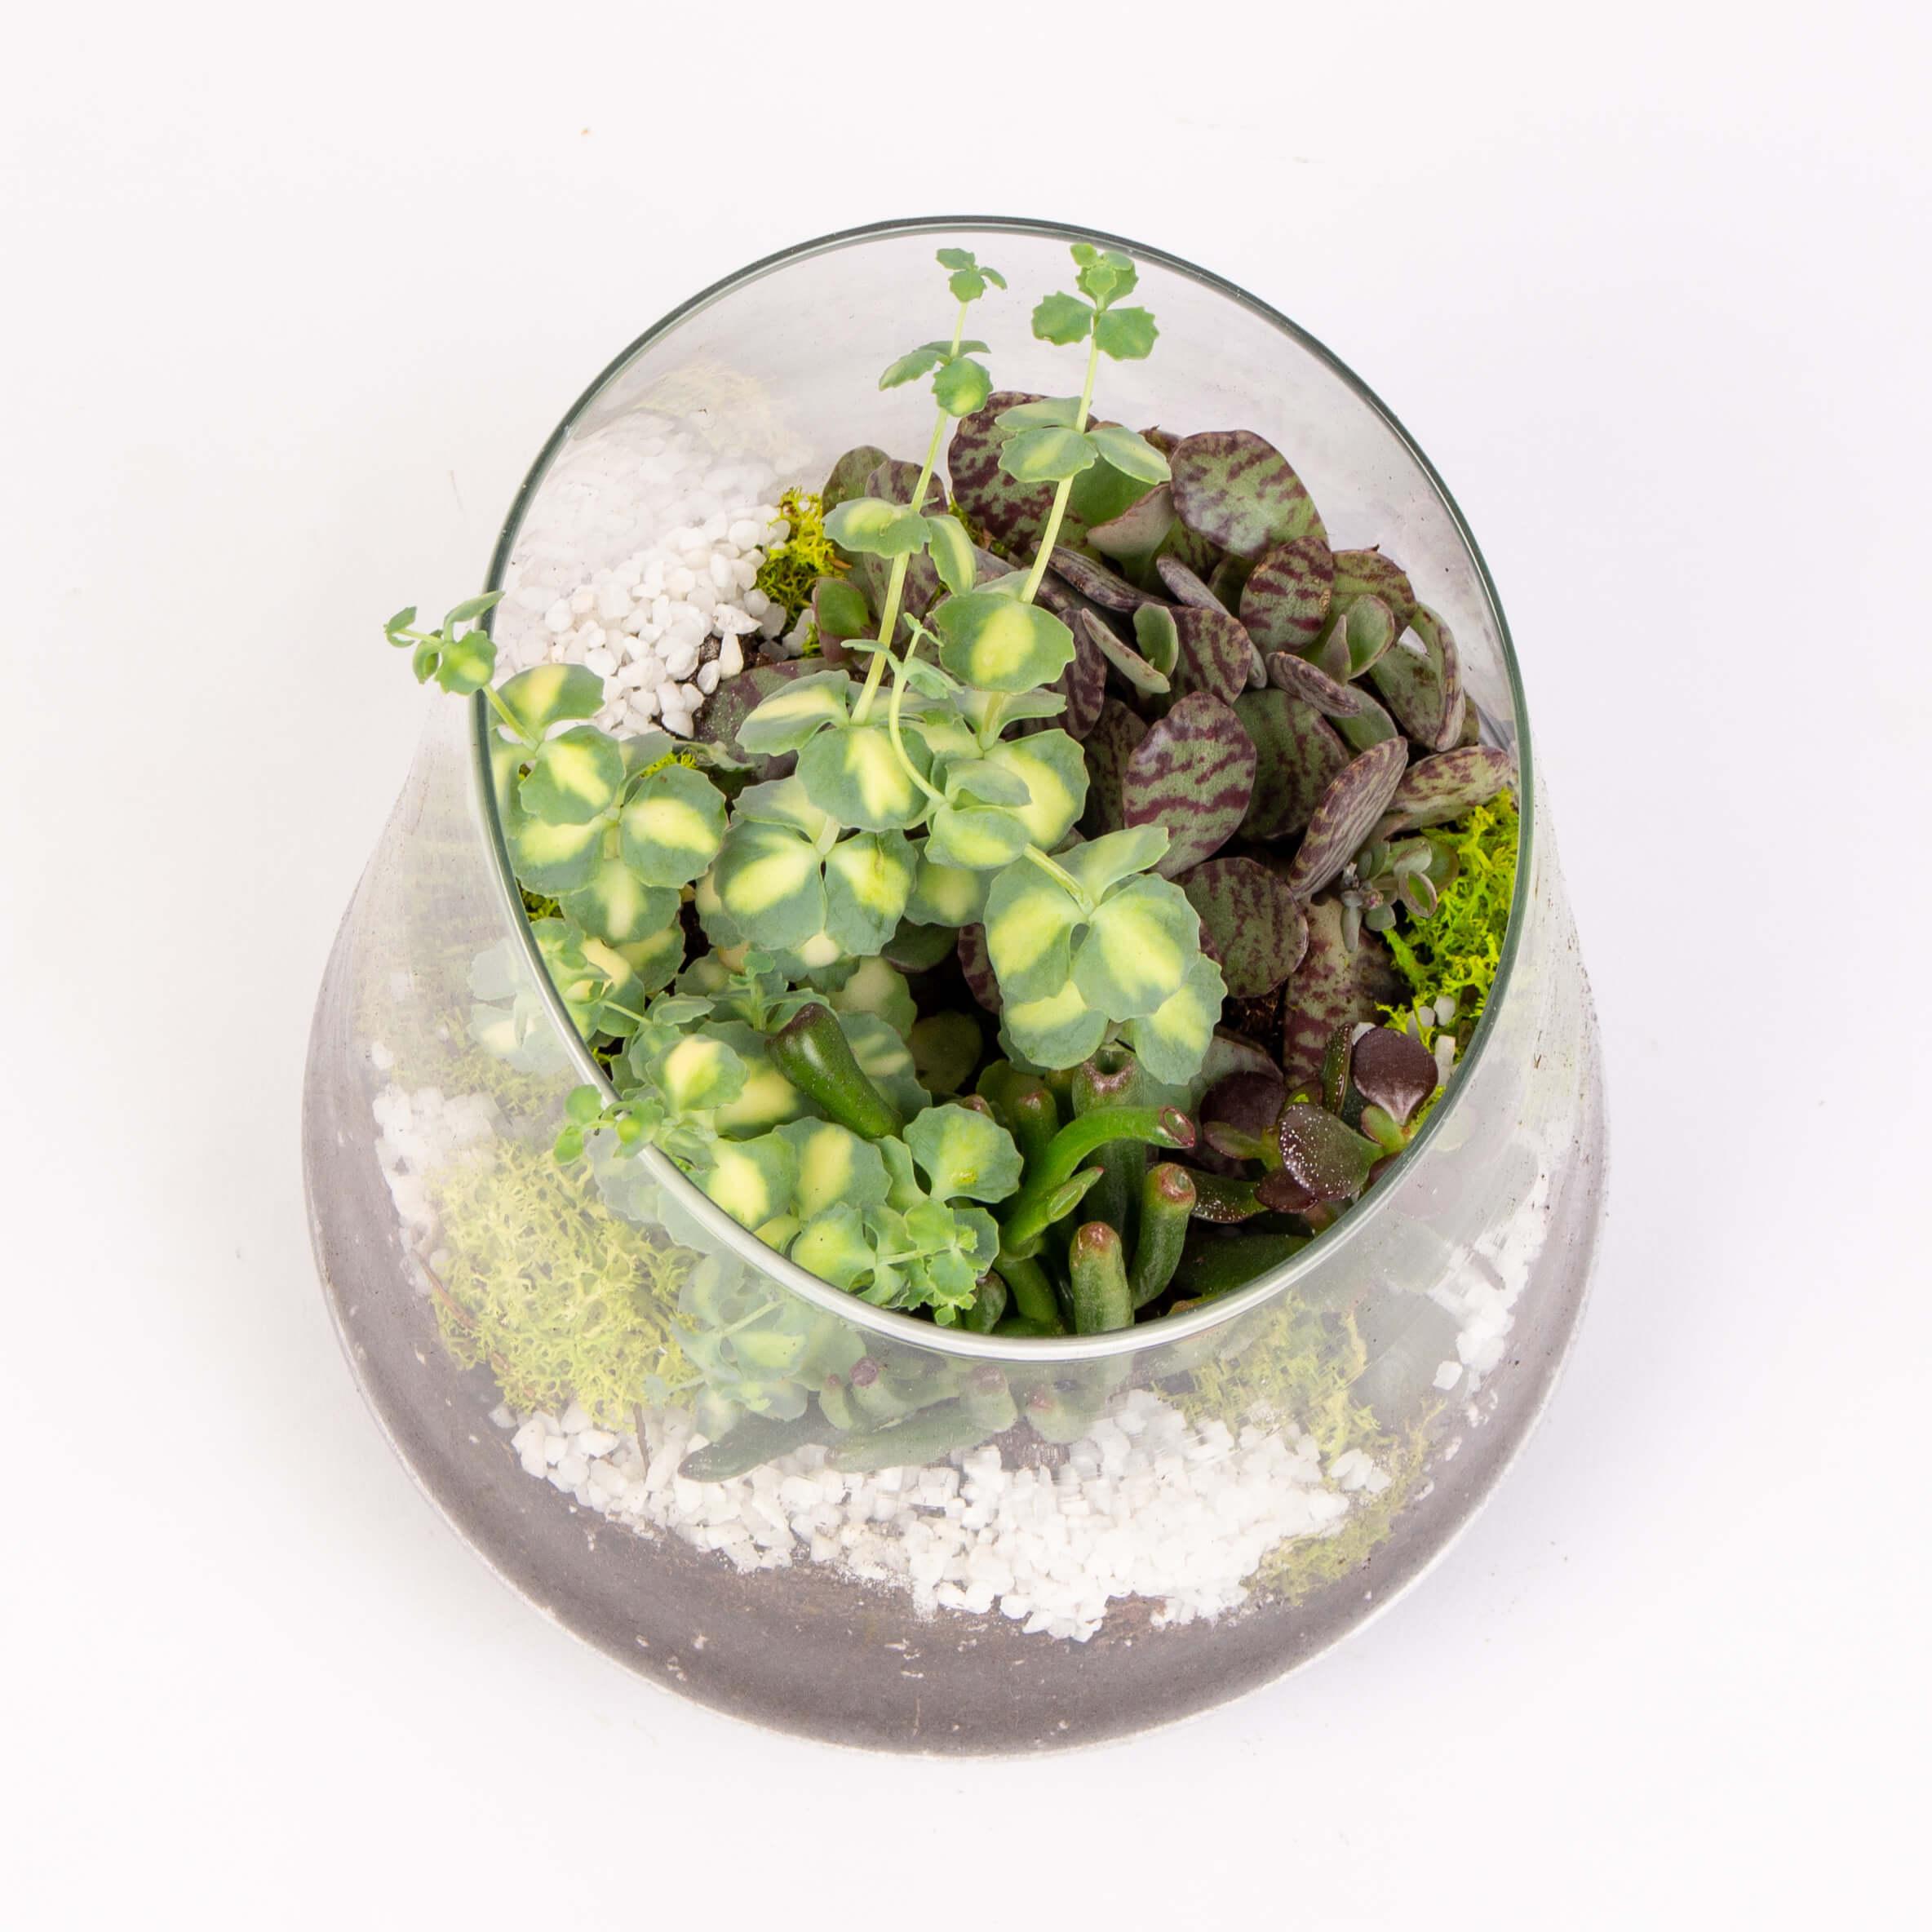 Grasute in vas de sticla